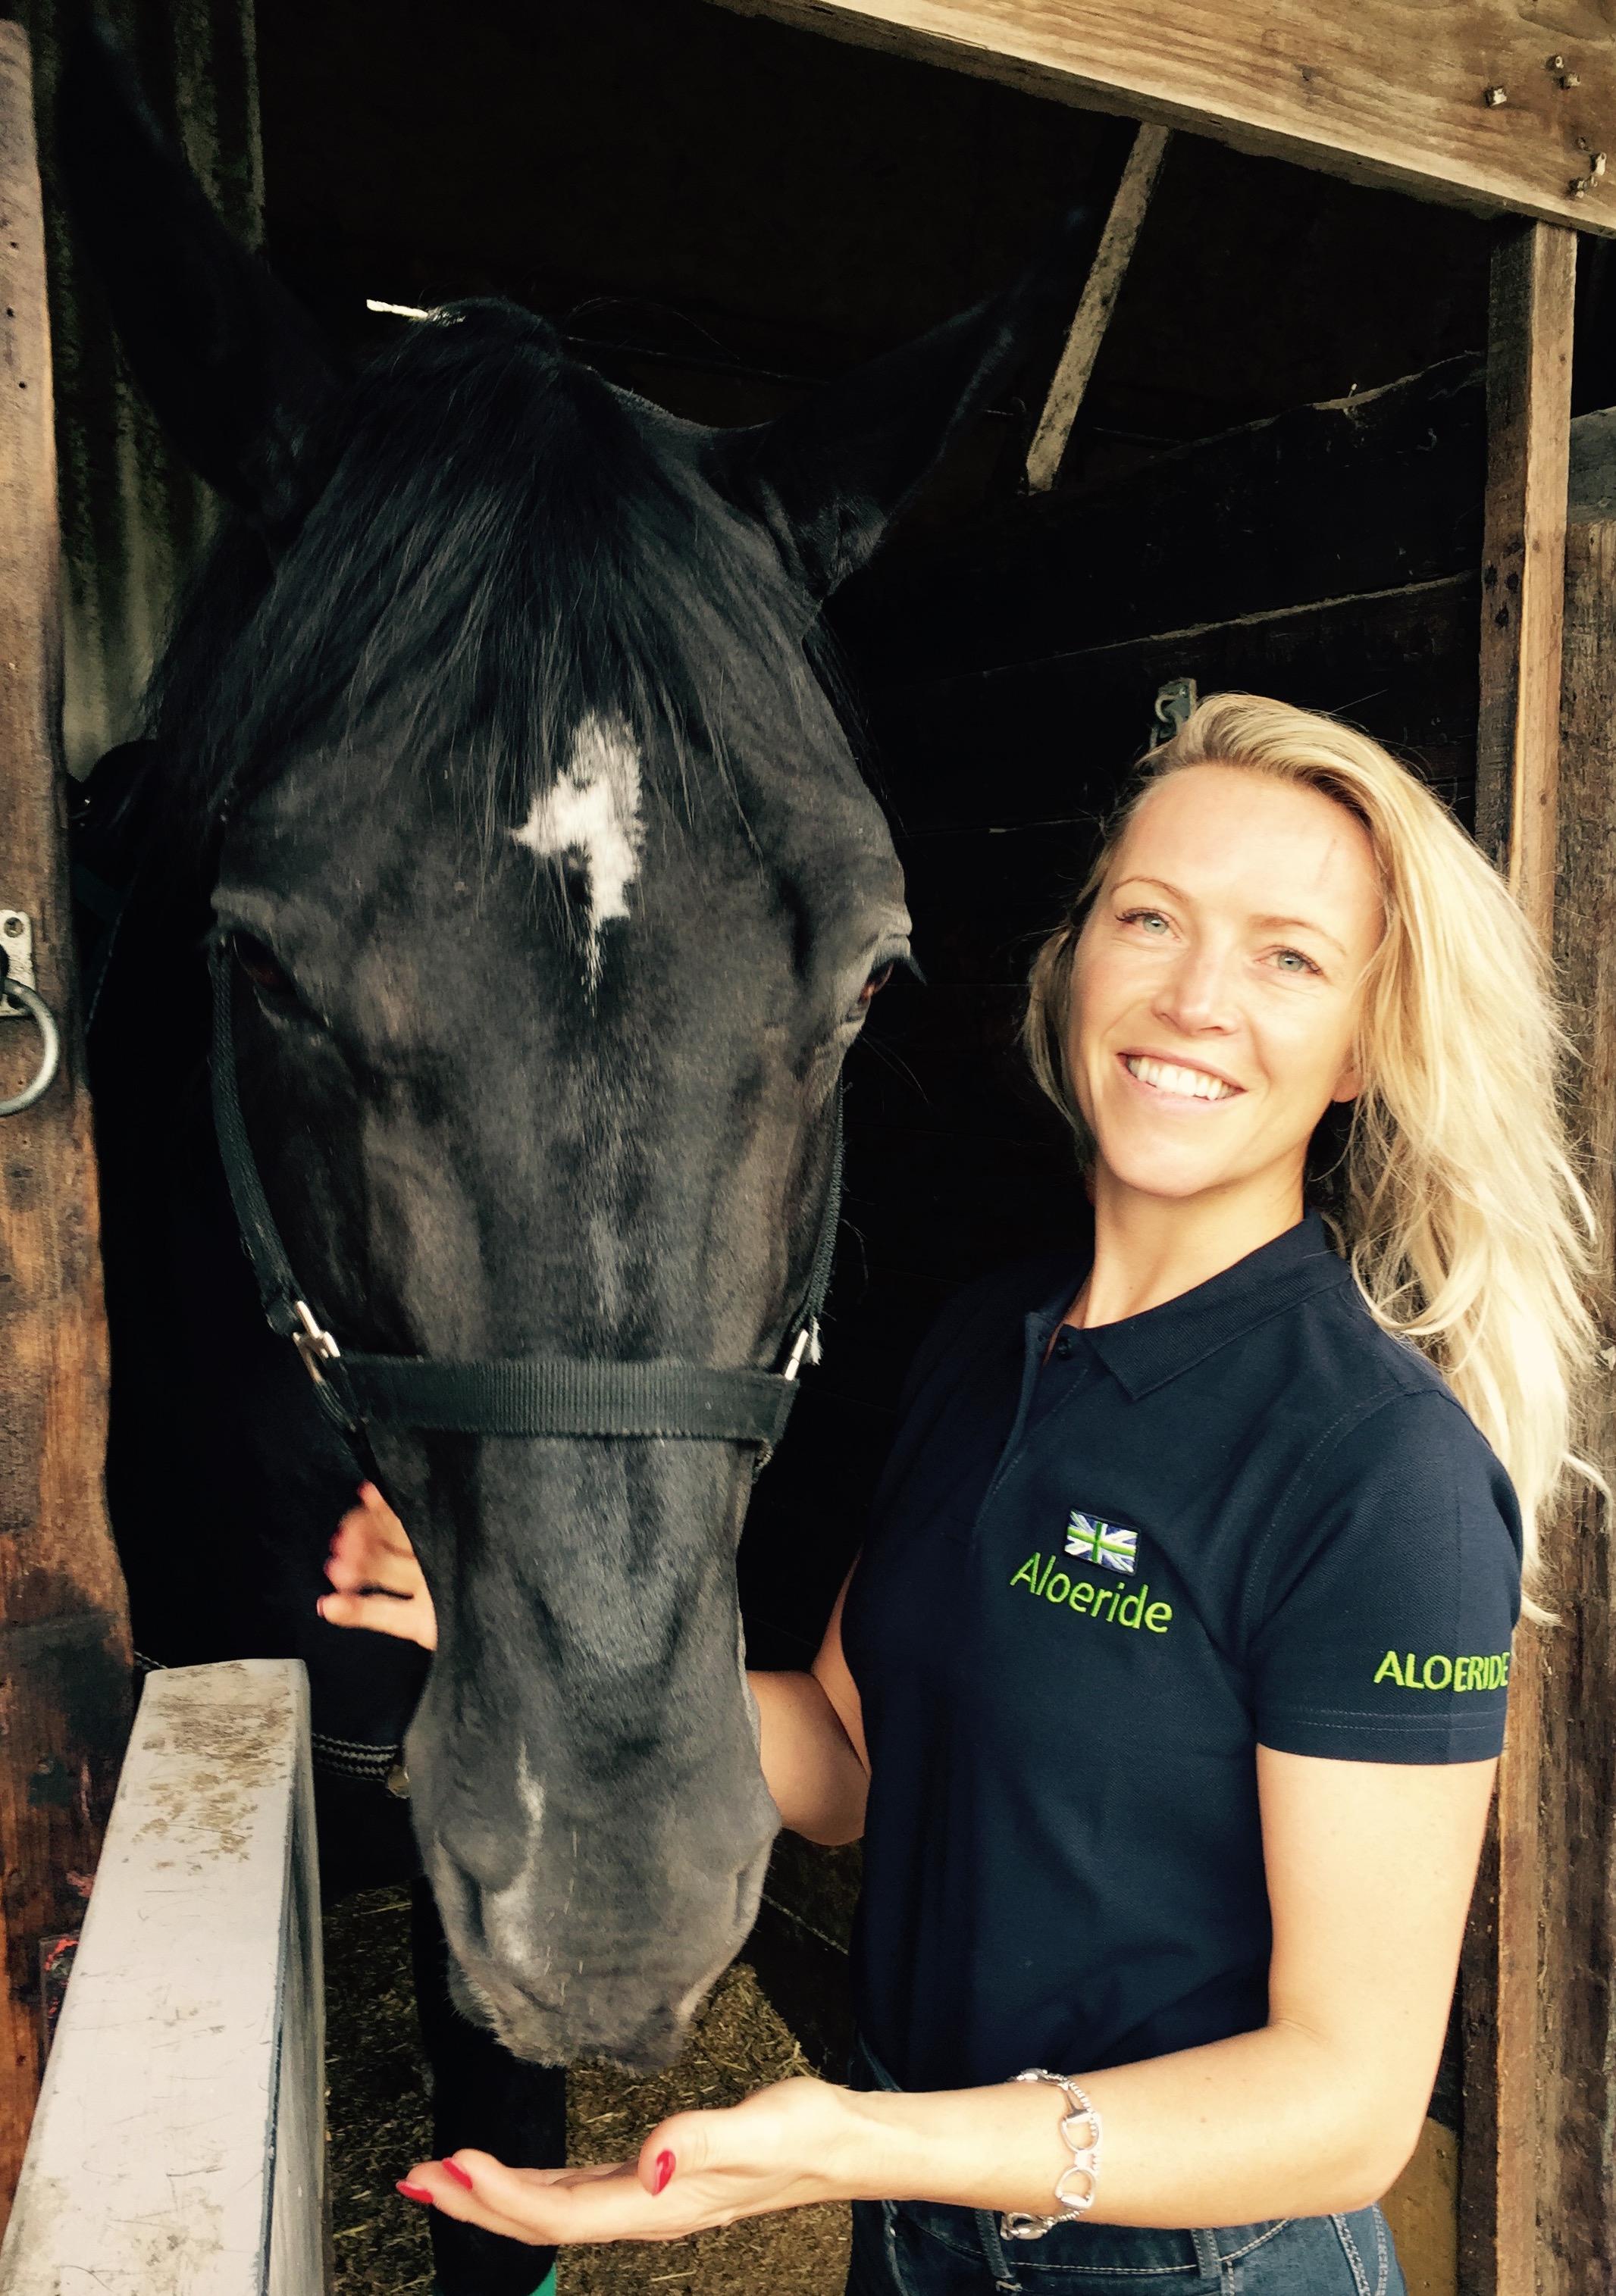 Leah Beckett Dressage Rider & Aloeride Sponsored Rider